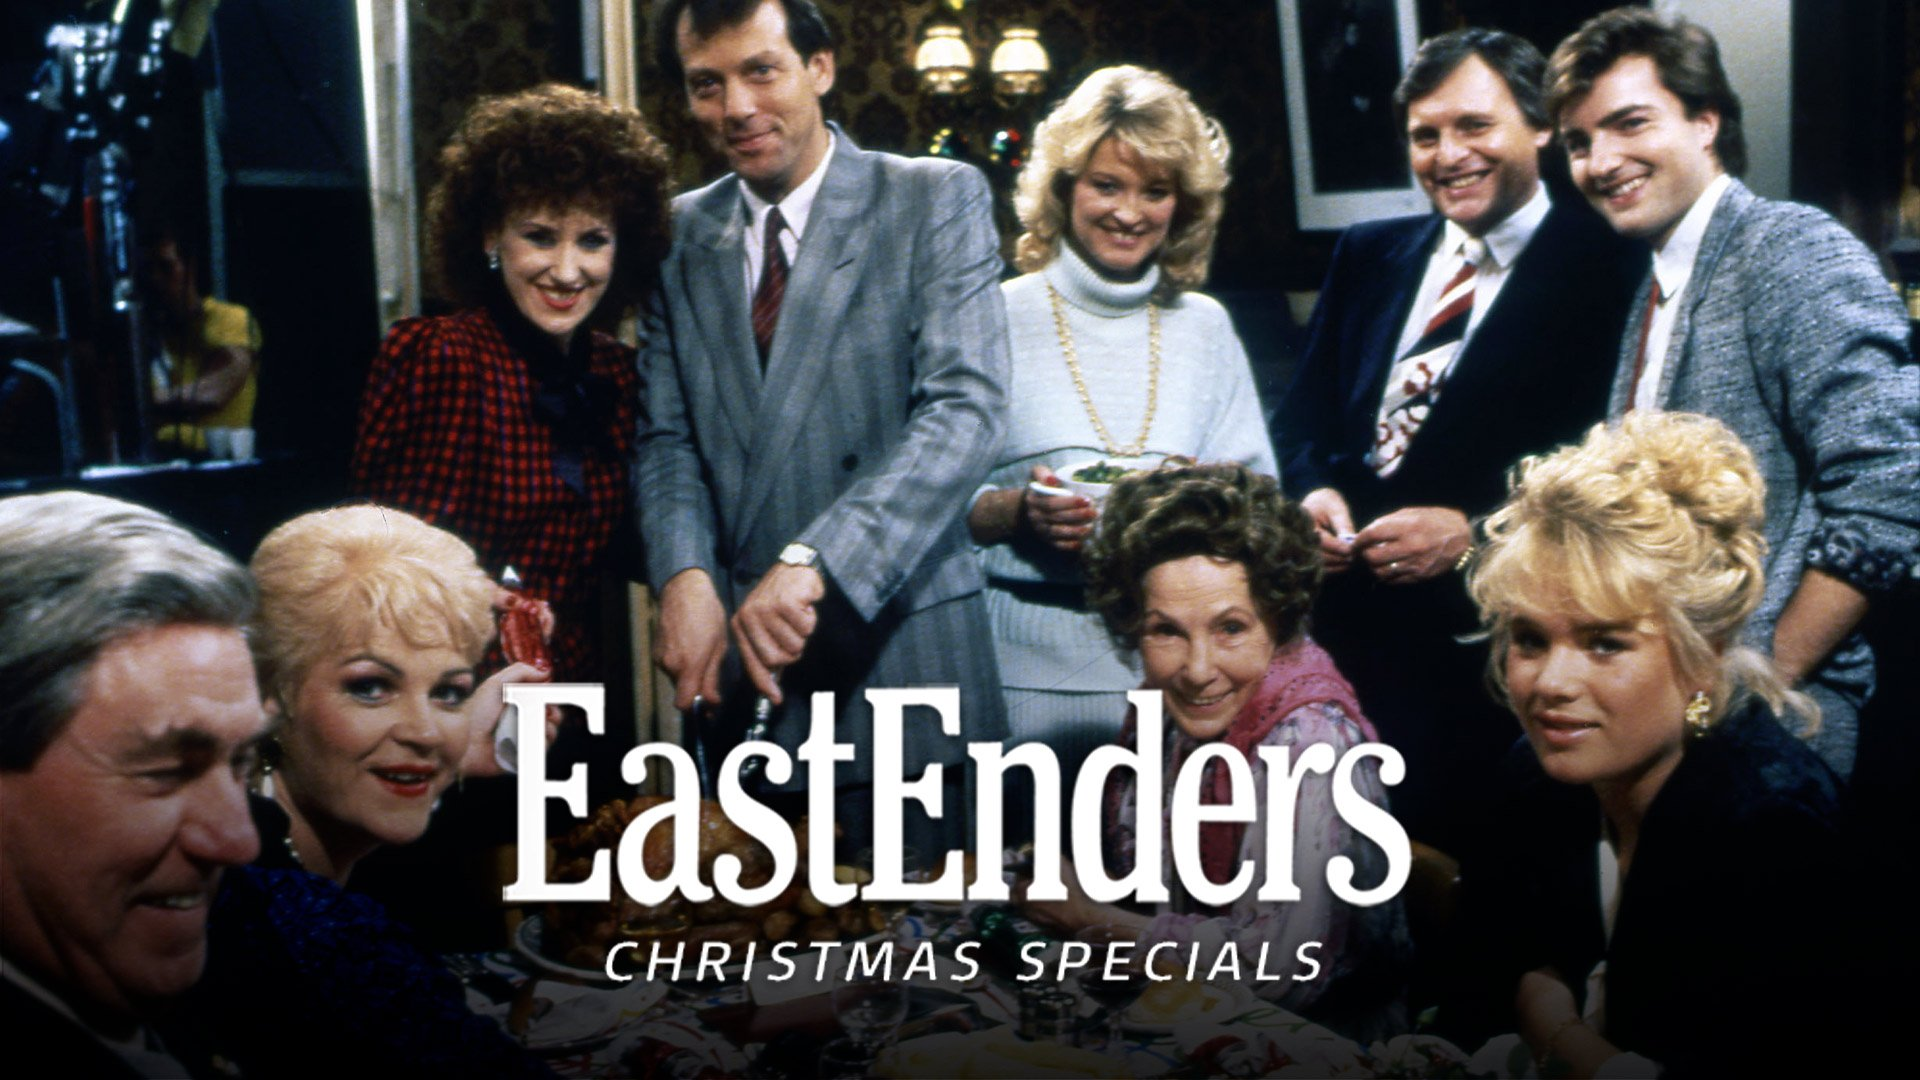 EastEnders Christmas Specials on BritBox UK